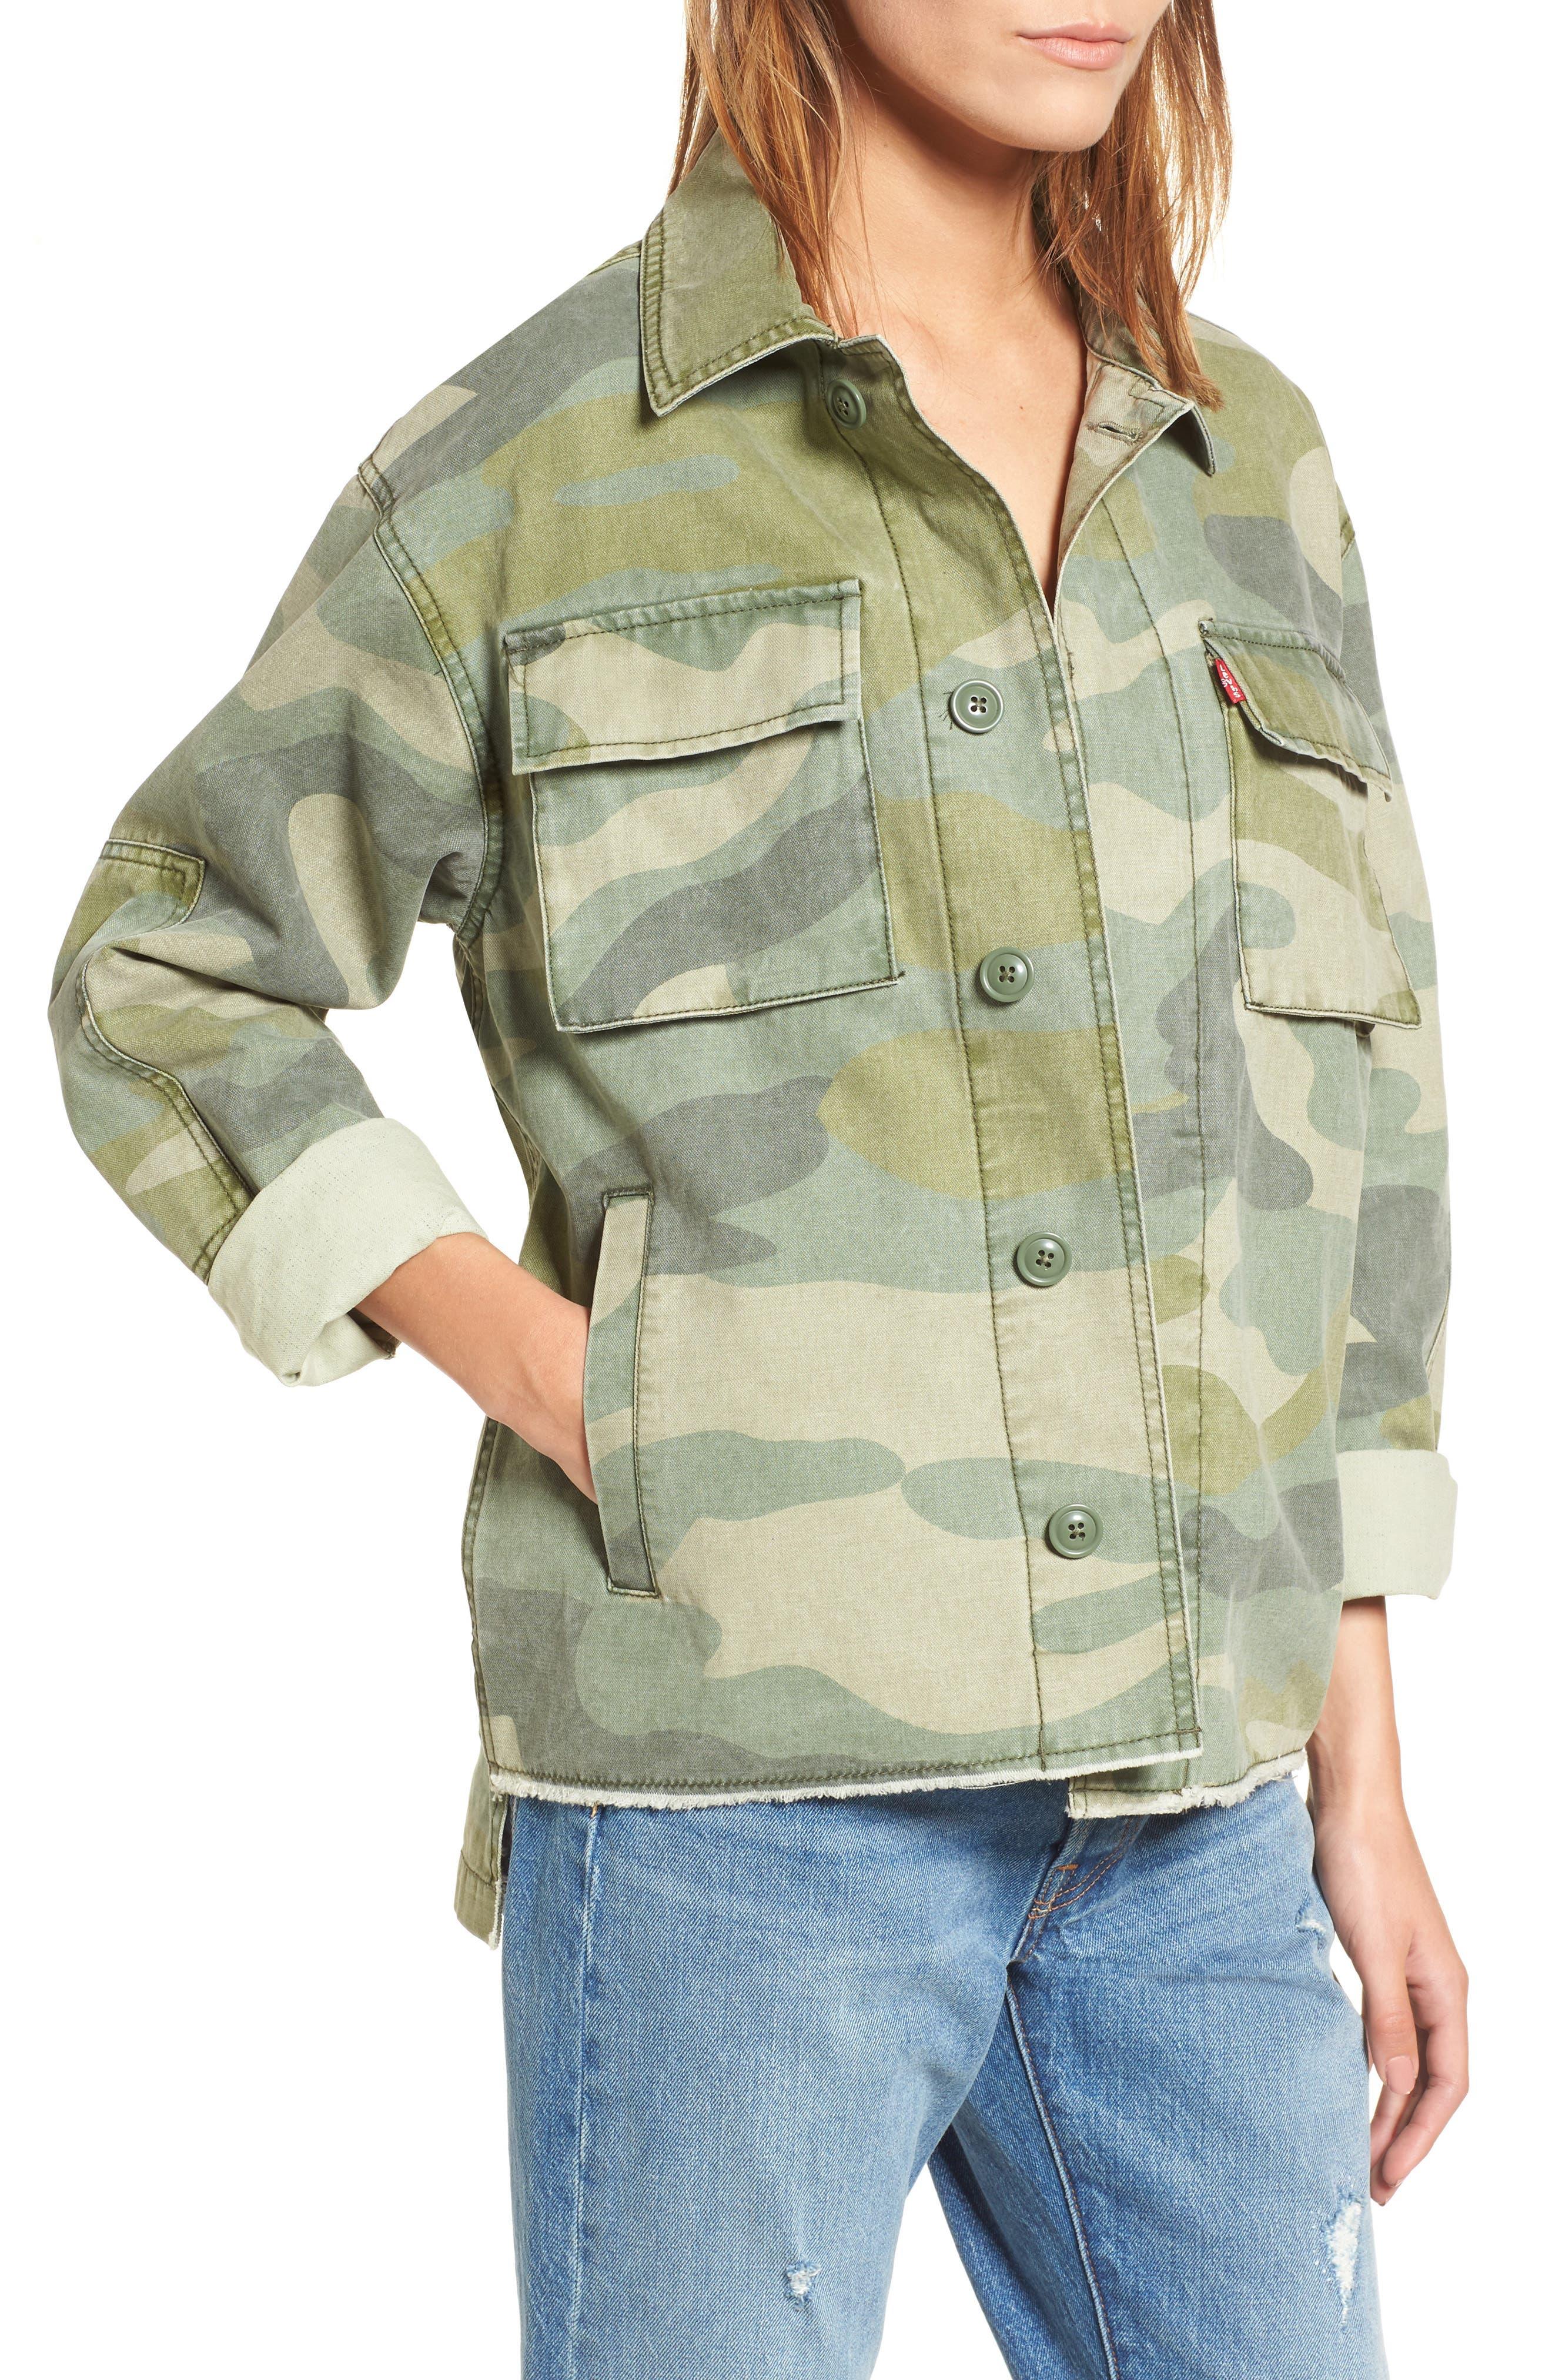 Main Image - Levi's® Oversize Cotton Canvas Camo Shirt Jacket